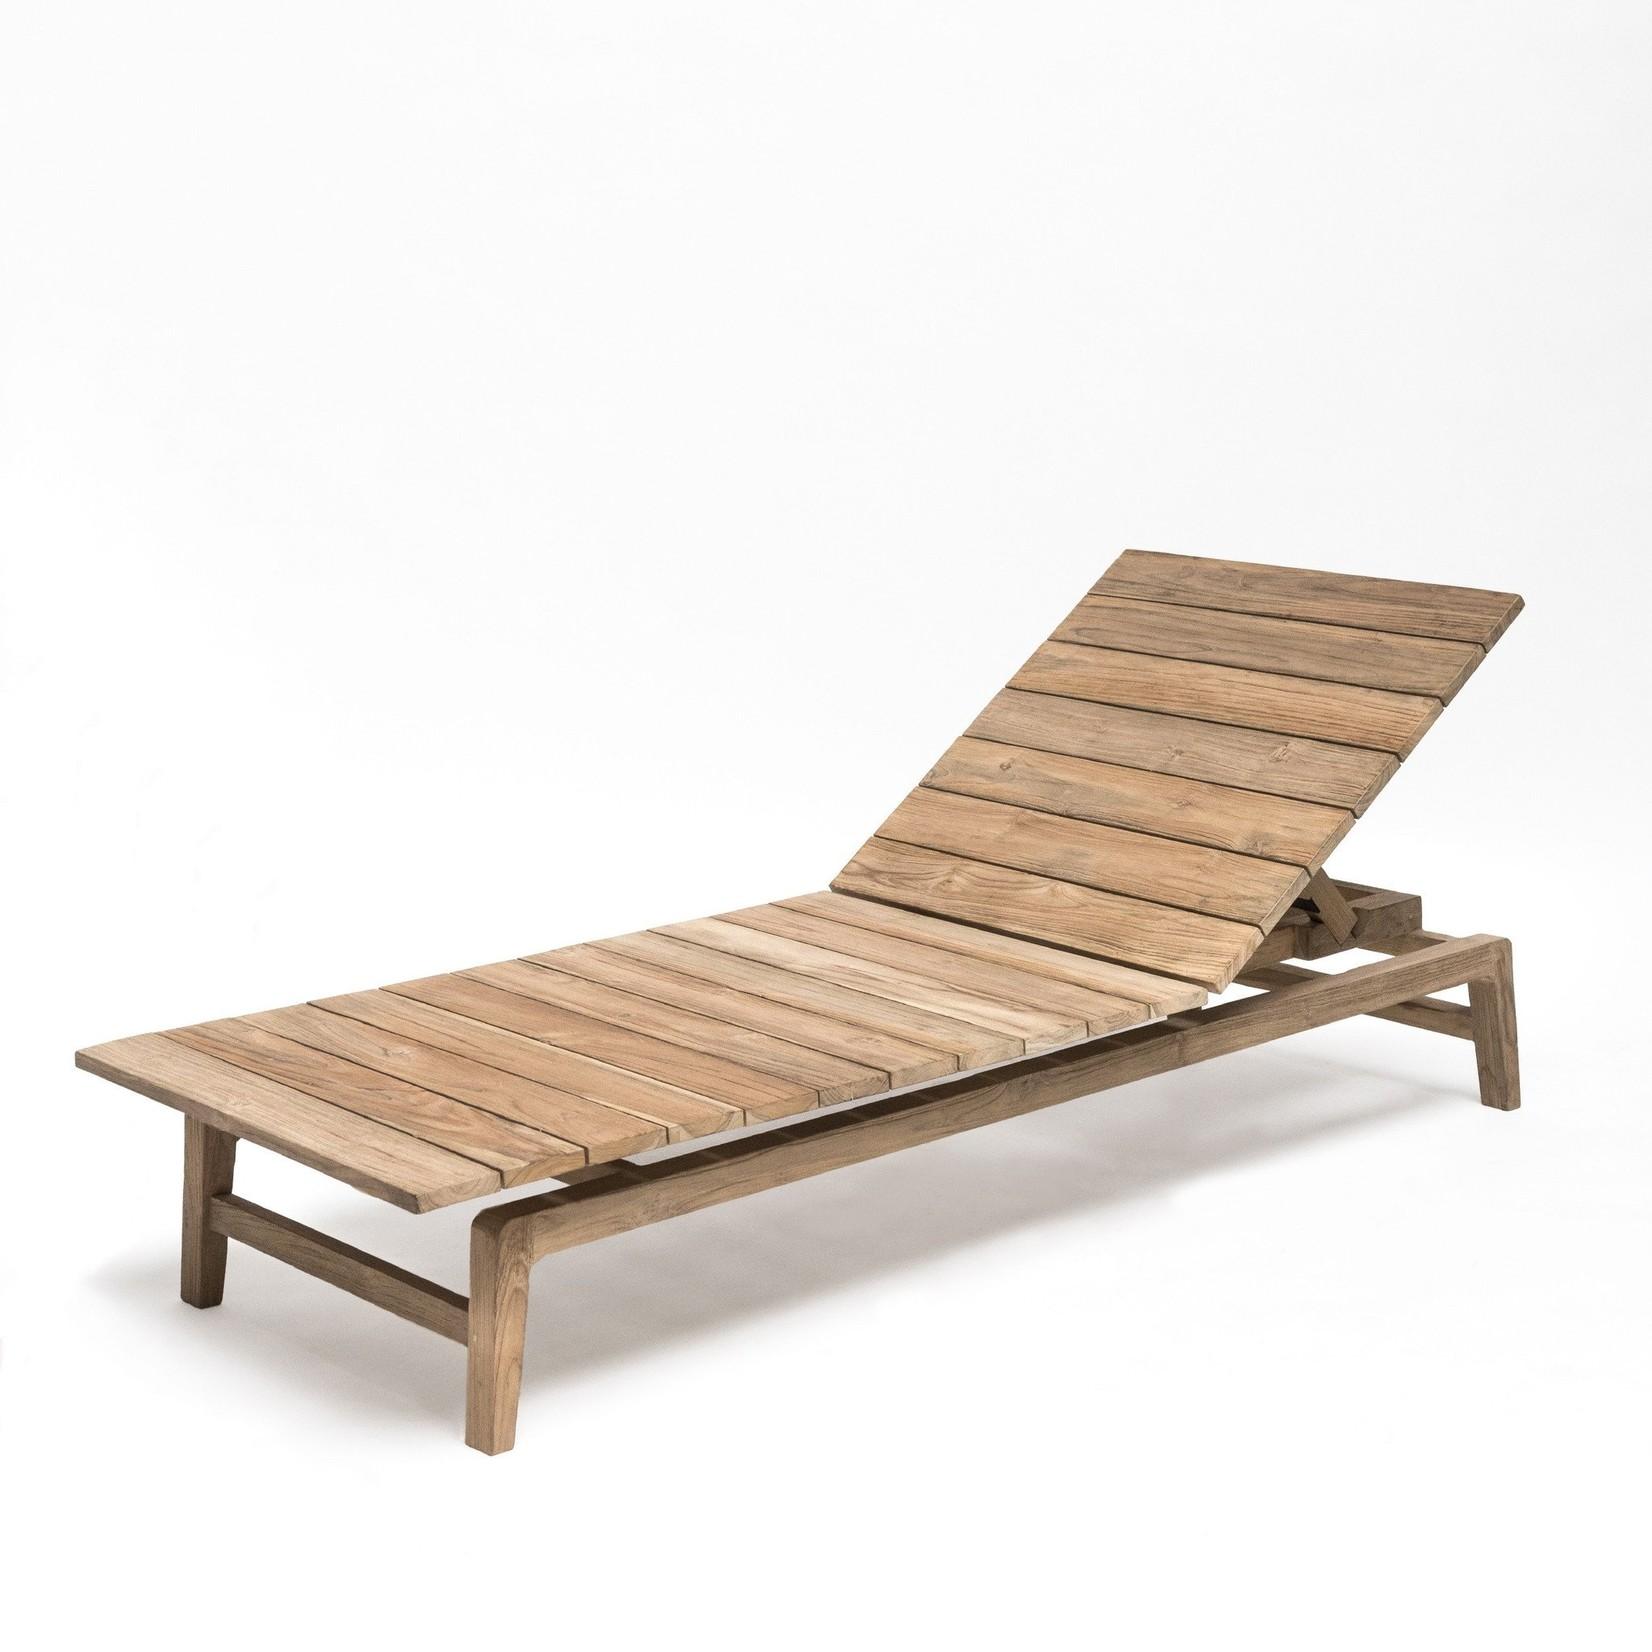 Gommaire Sunbed Copenhague   Reclaimed Teak Natural Gray + Cushion